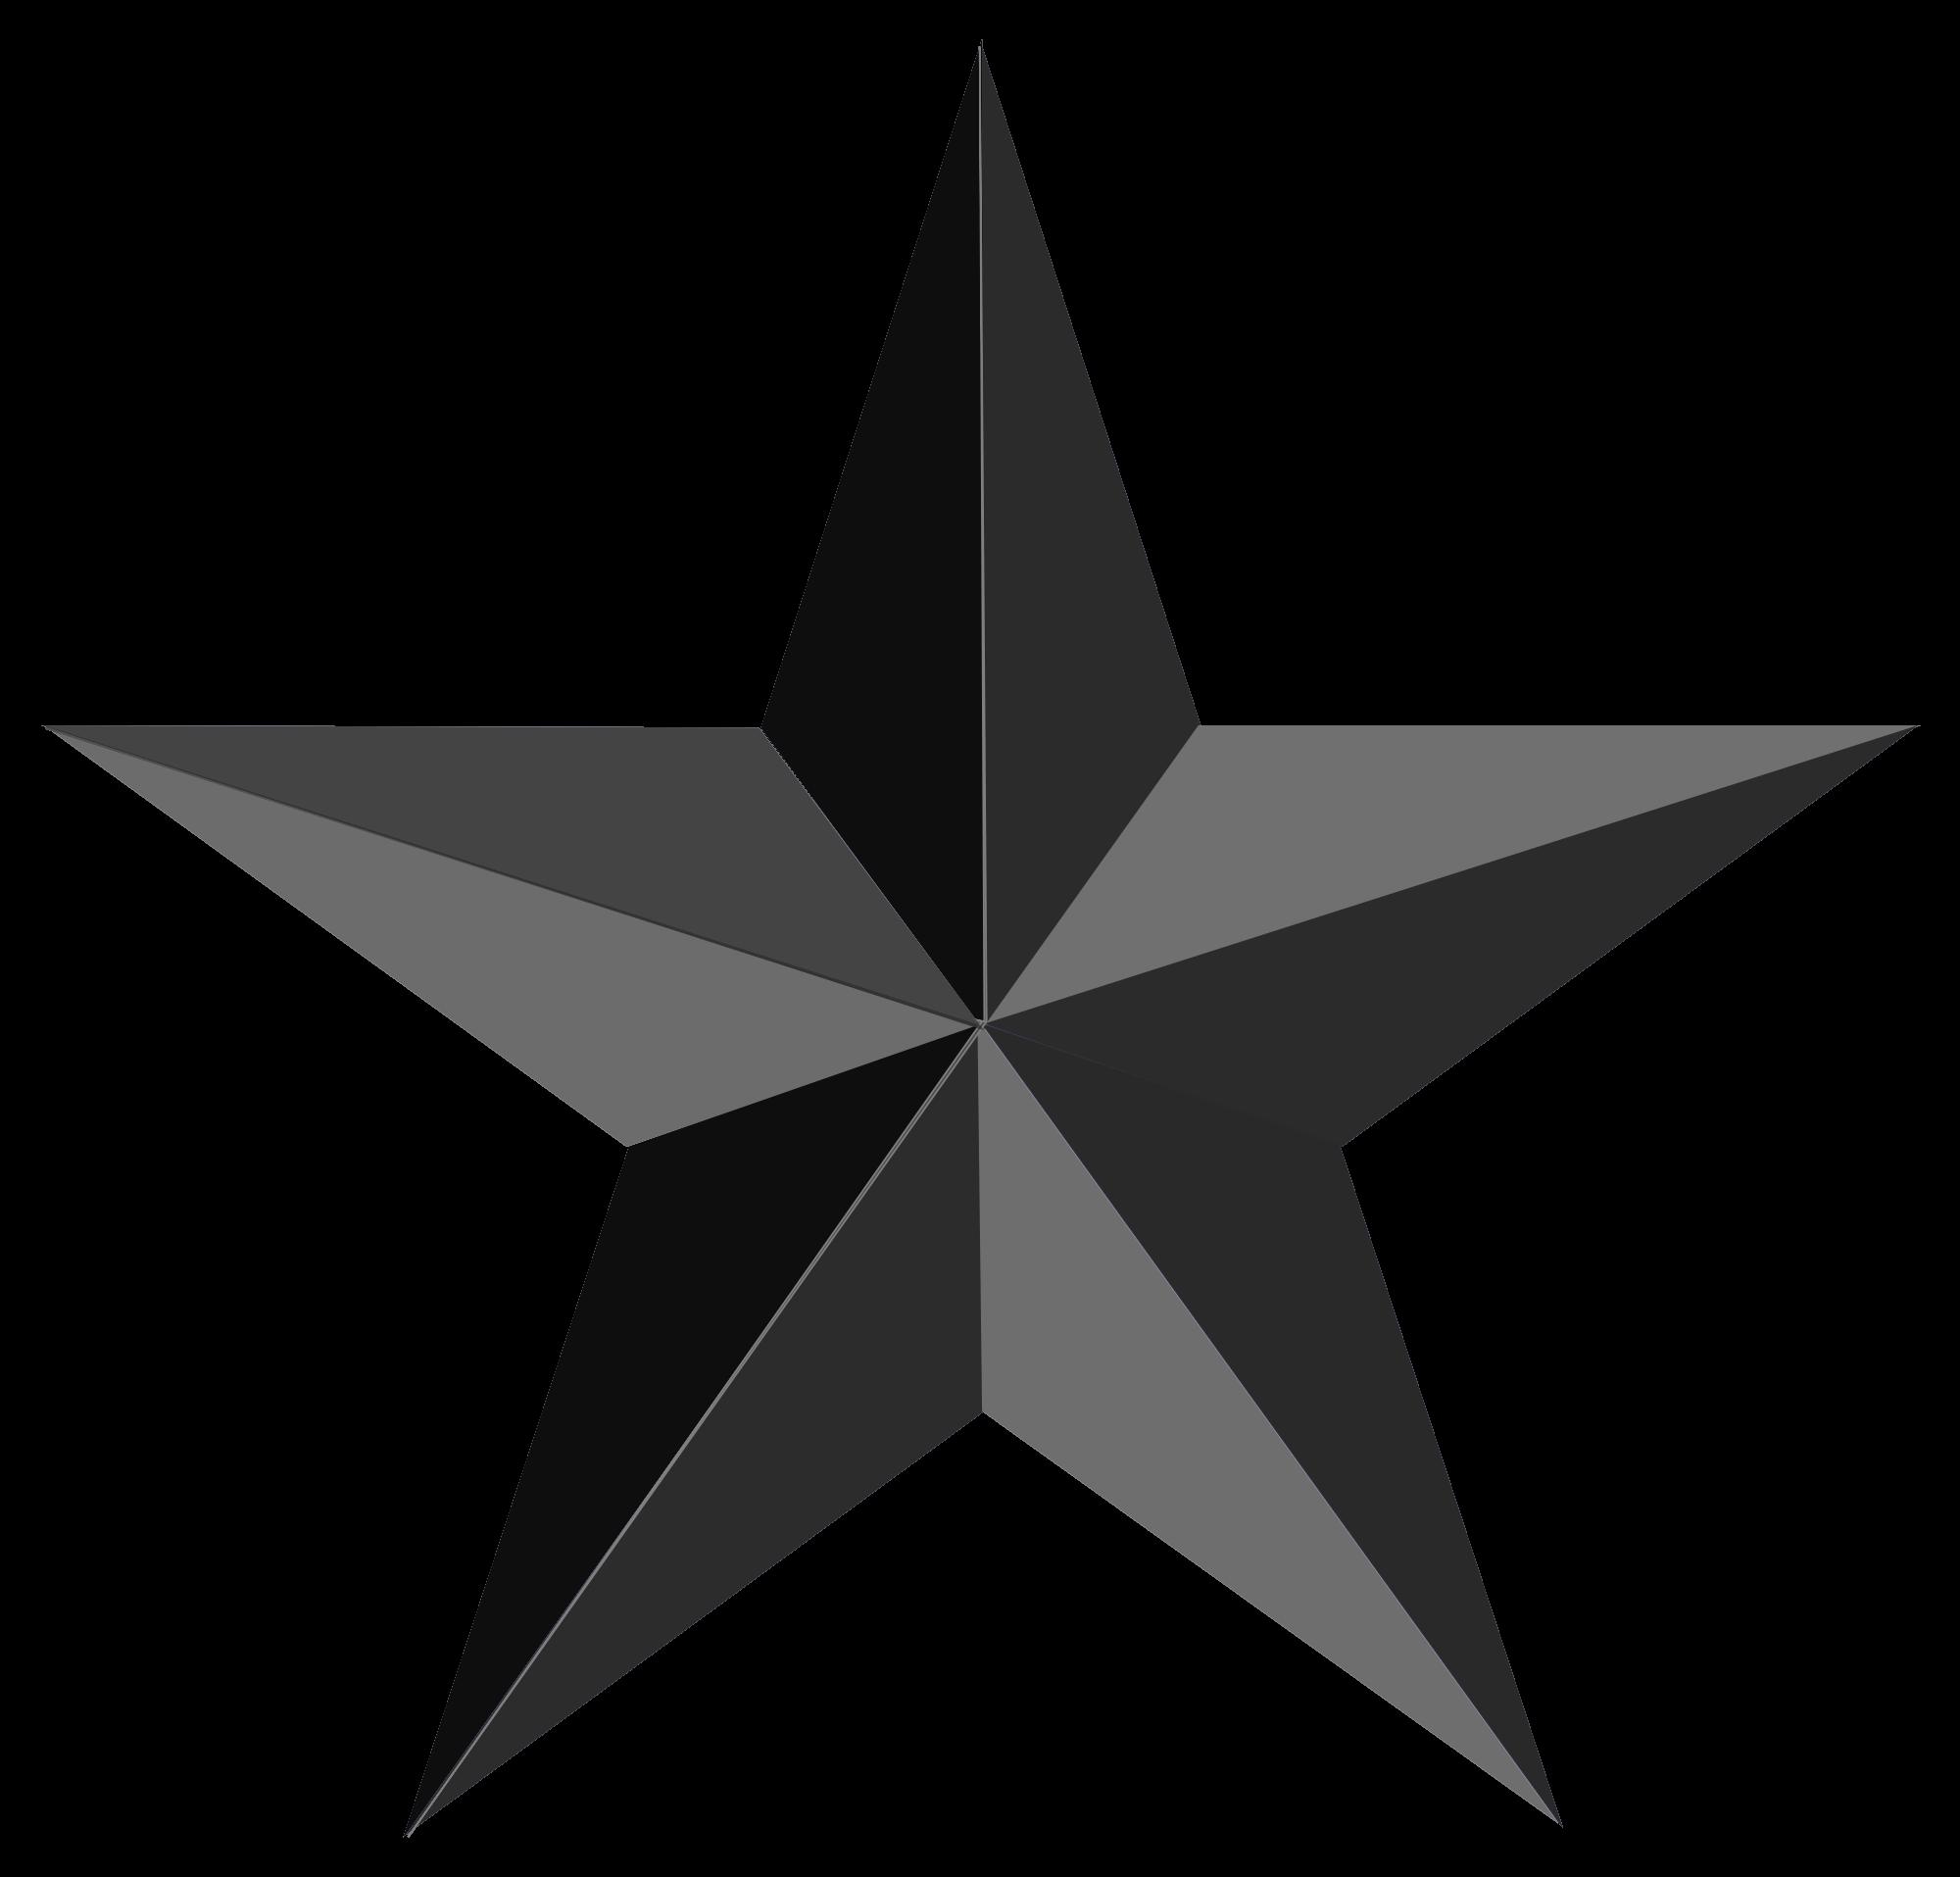 Image result for black star pics